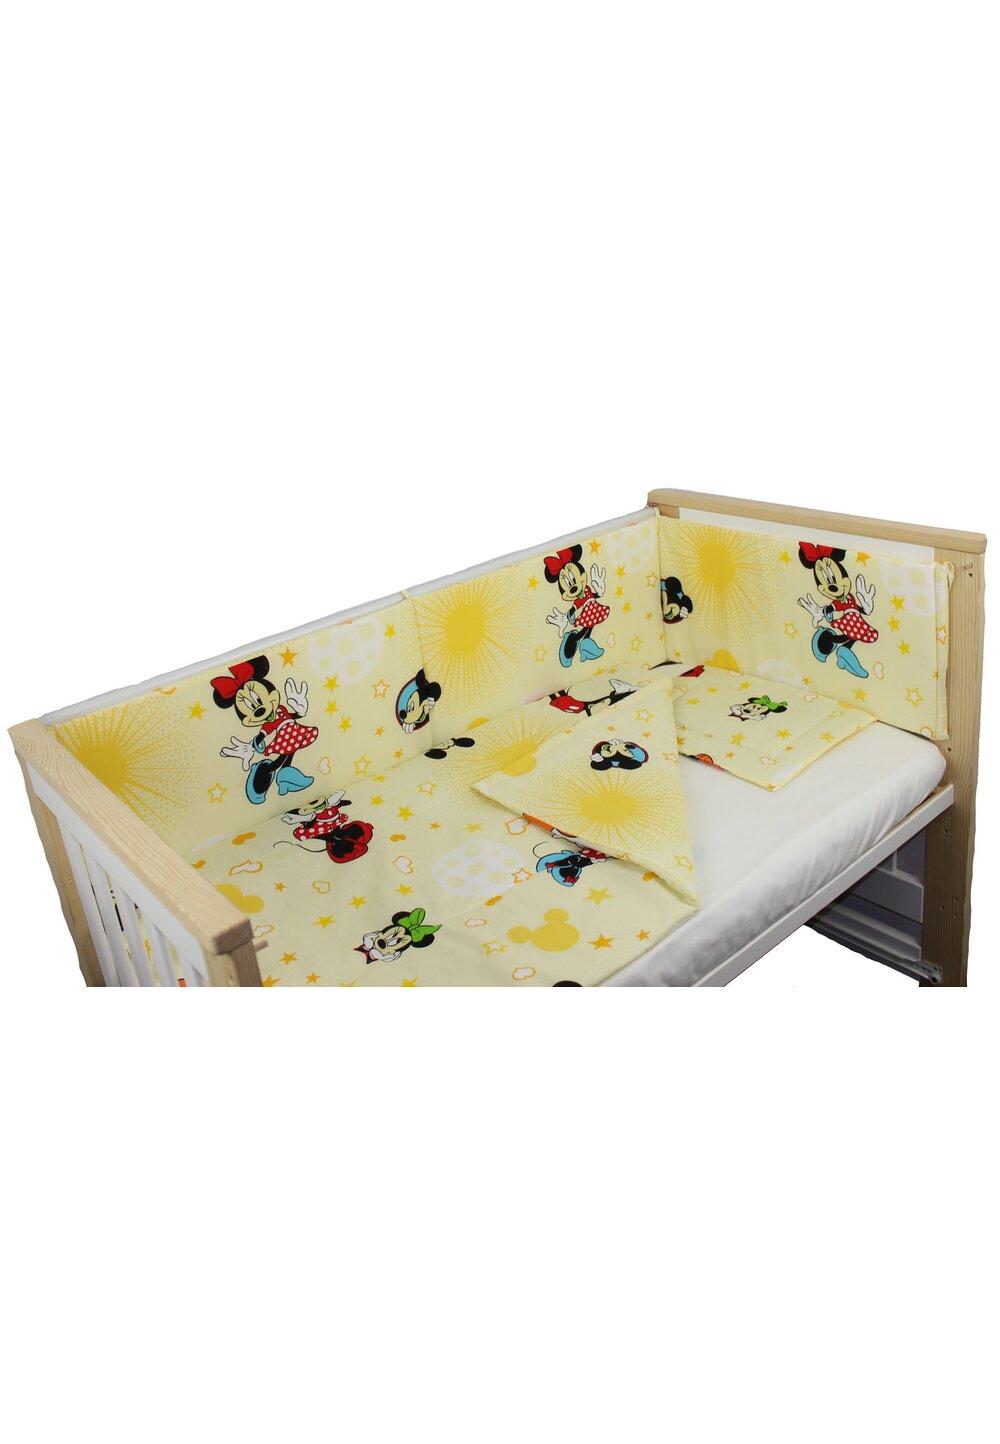 Lenjerie 4 piese, Minnie si Mickey, galben, 120x60cm imagine